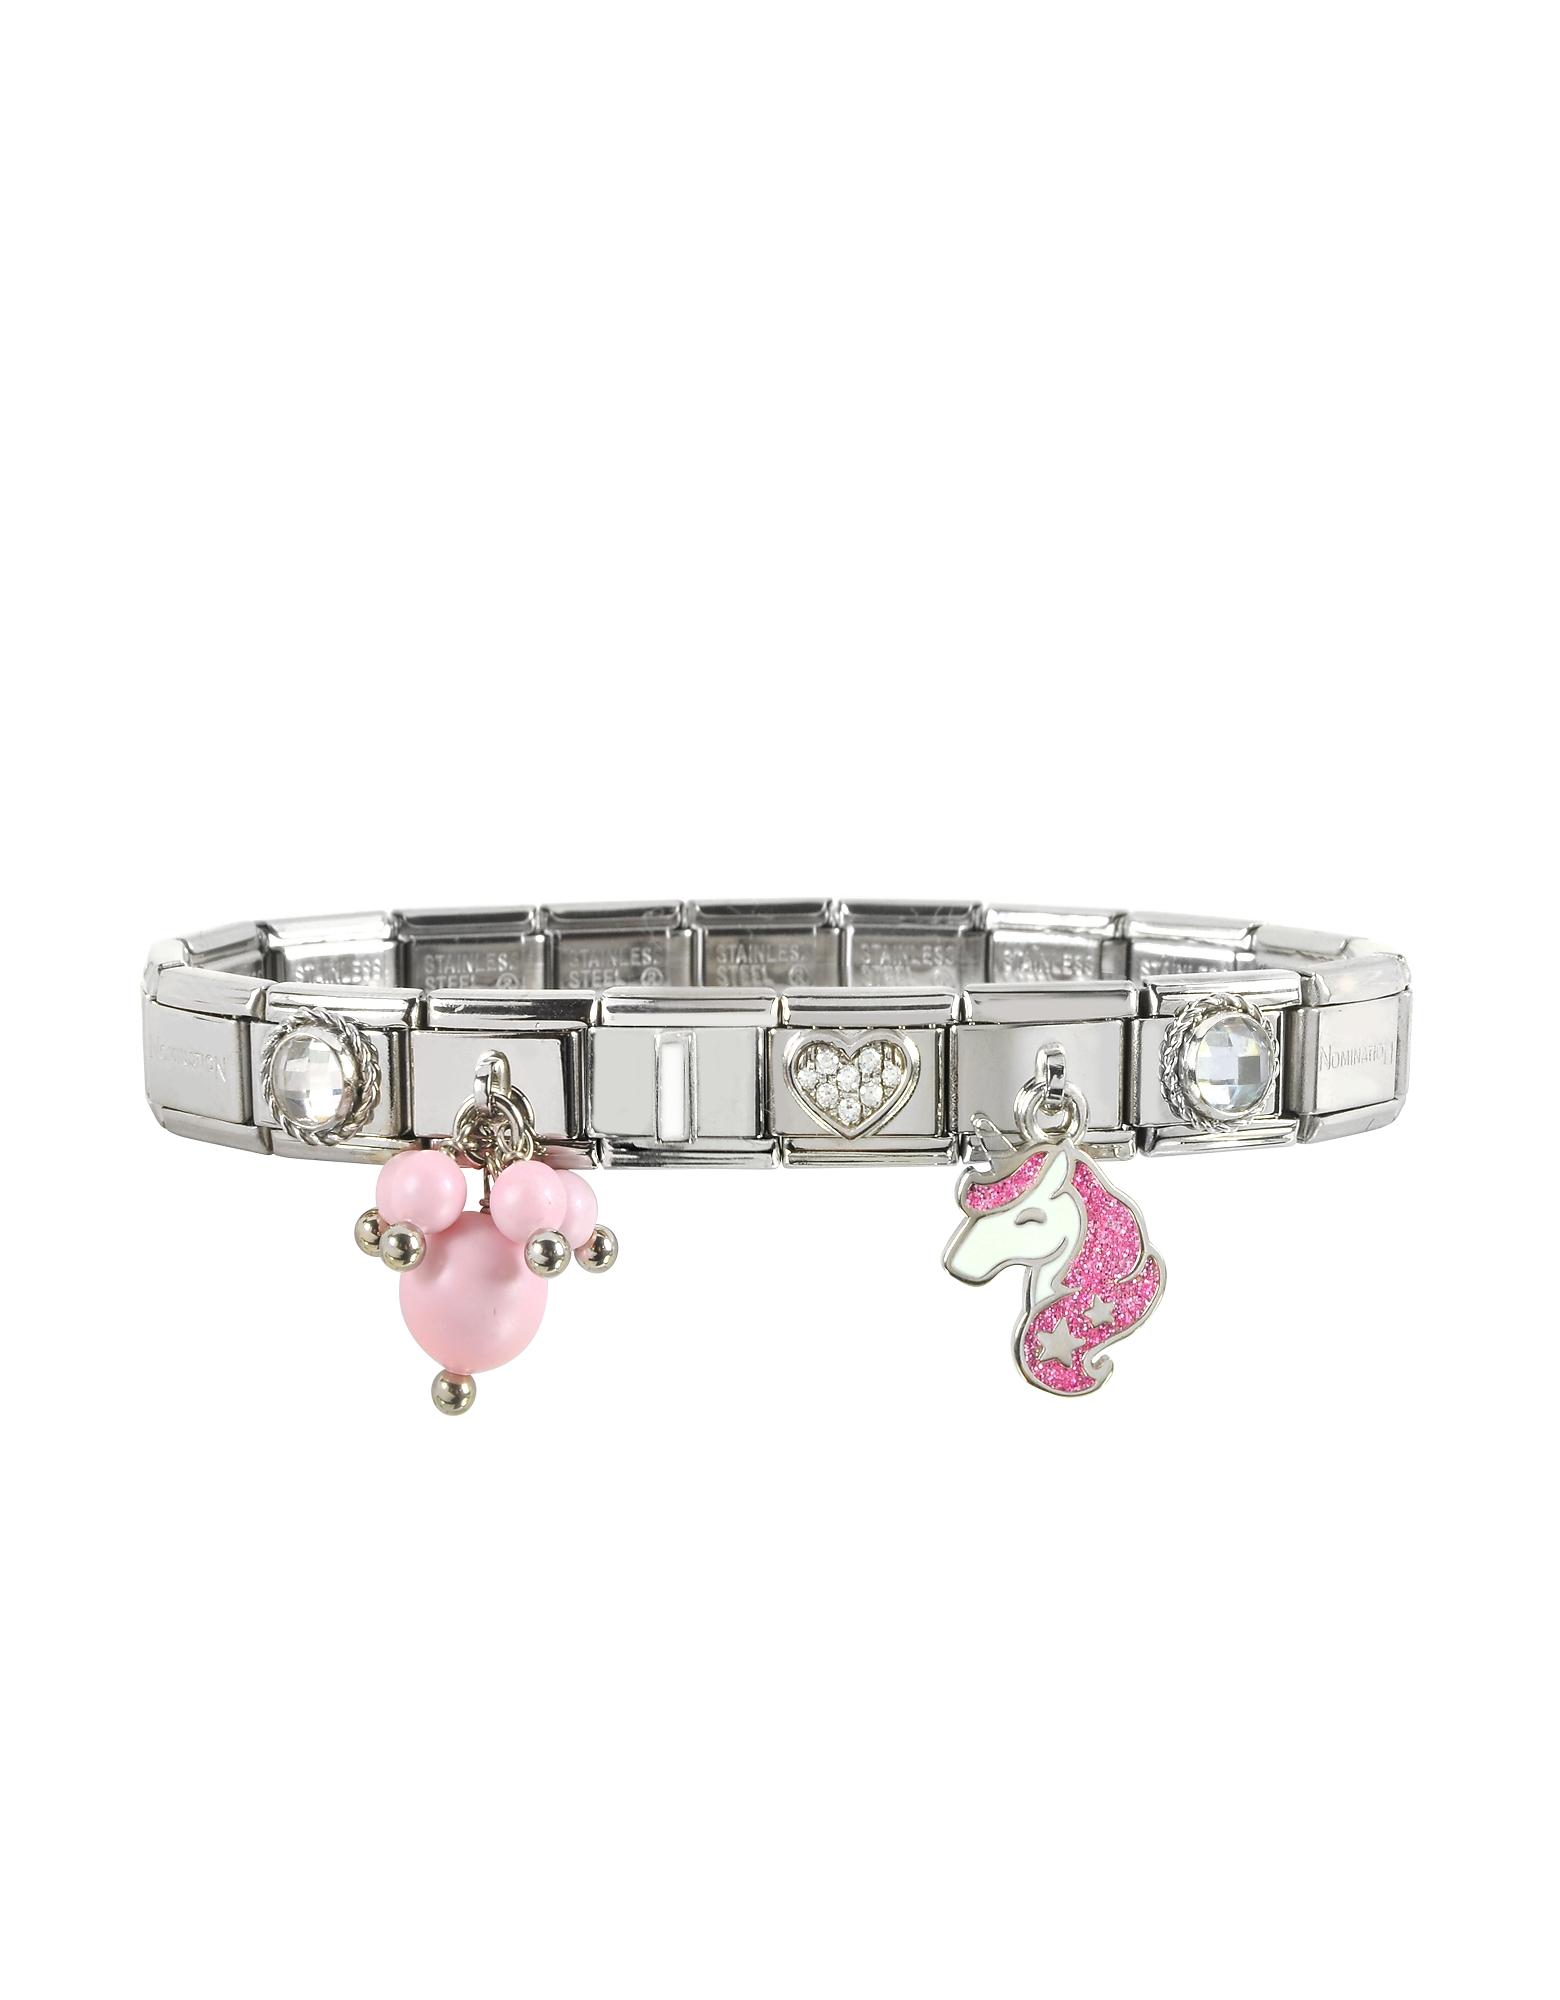 Nomination  Bracelets Pink Unicorn Sterling Silver & Stainless Steel Bracelet